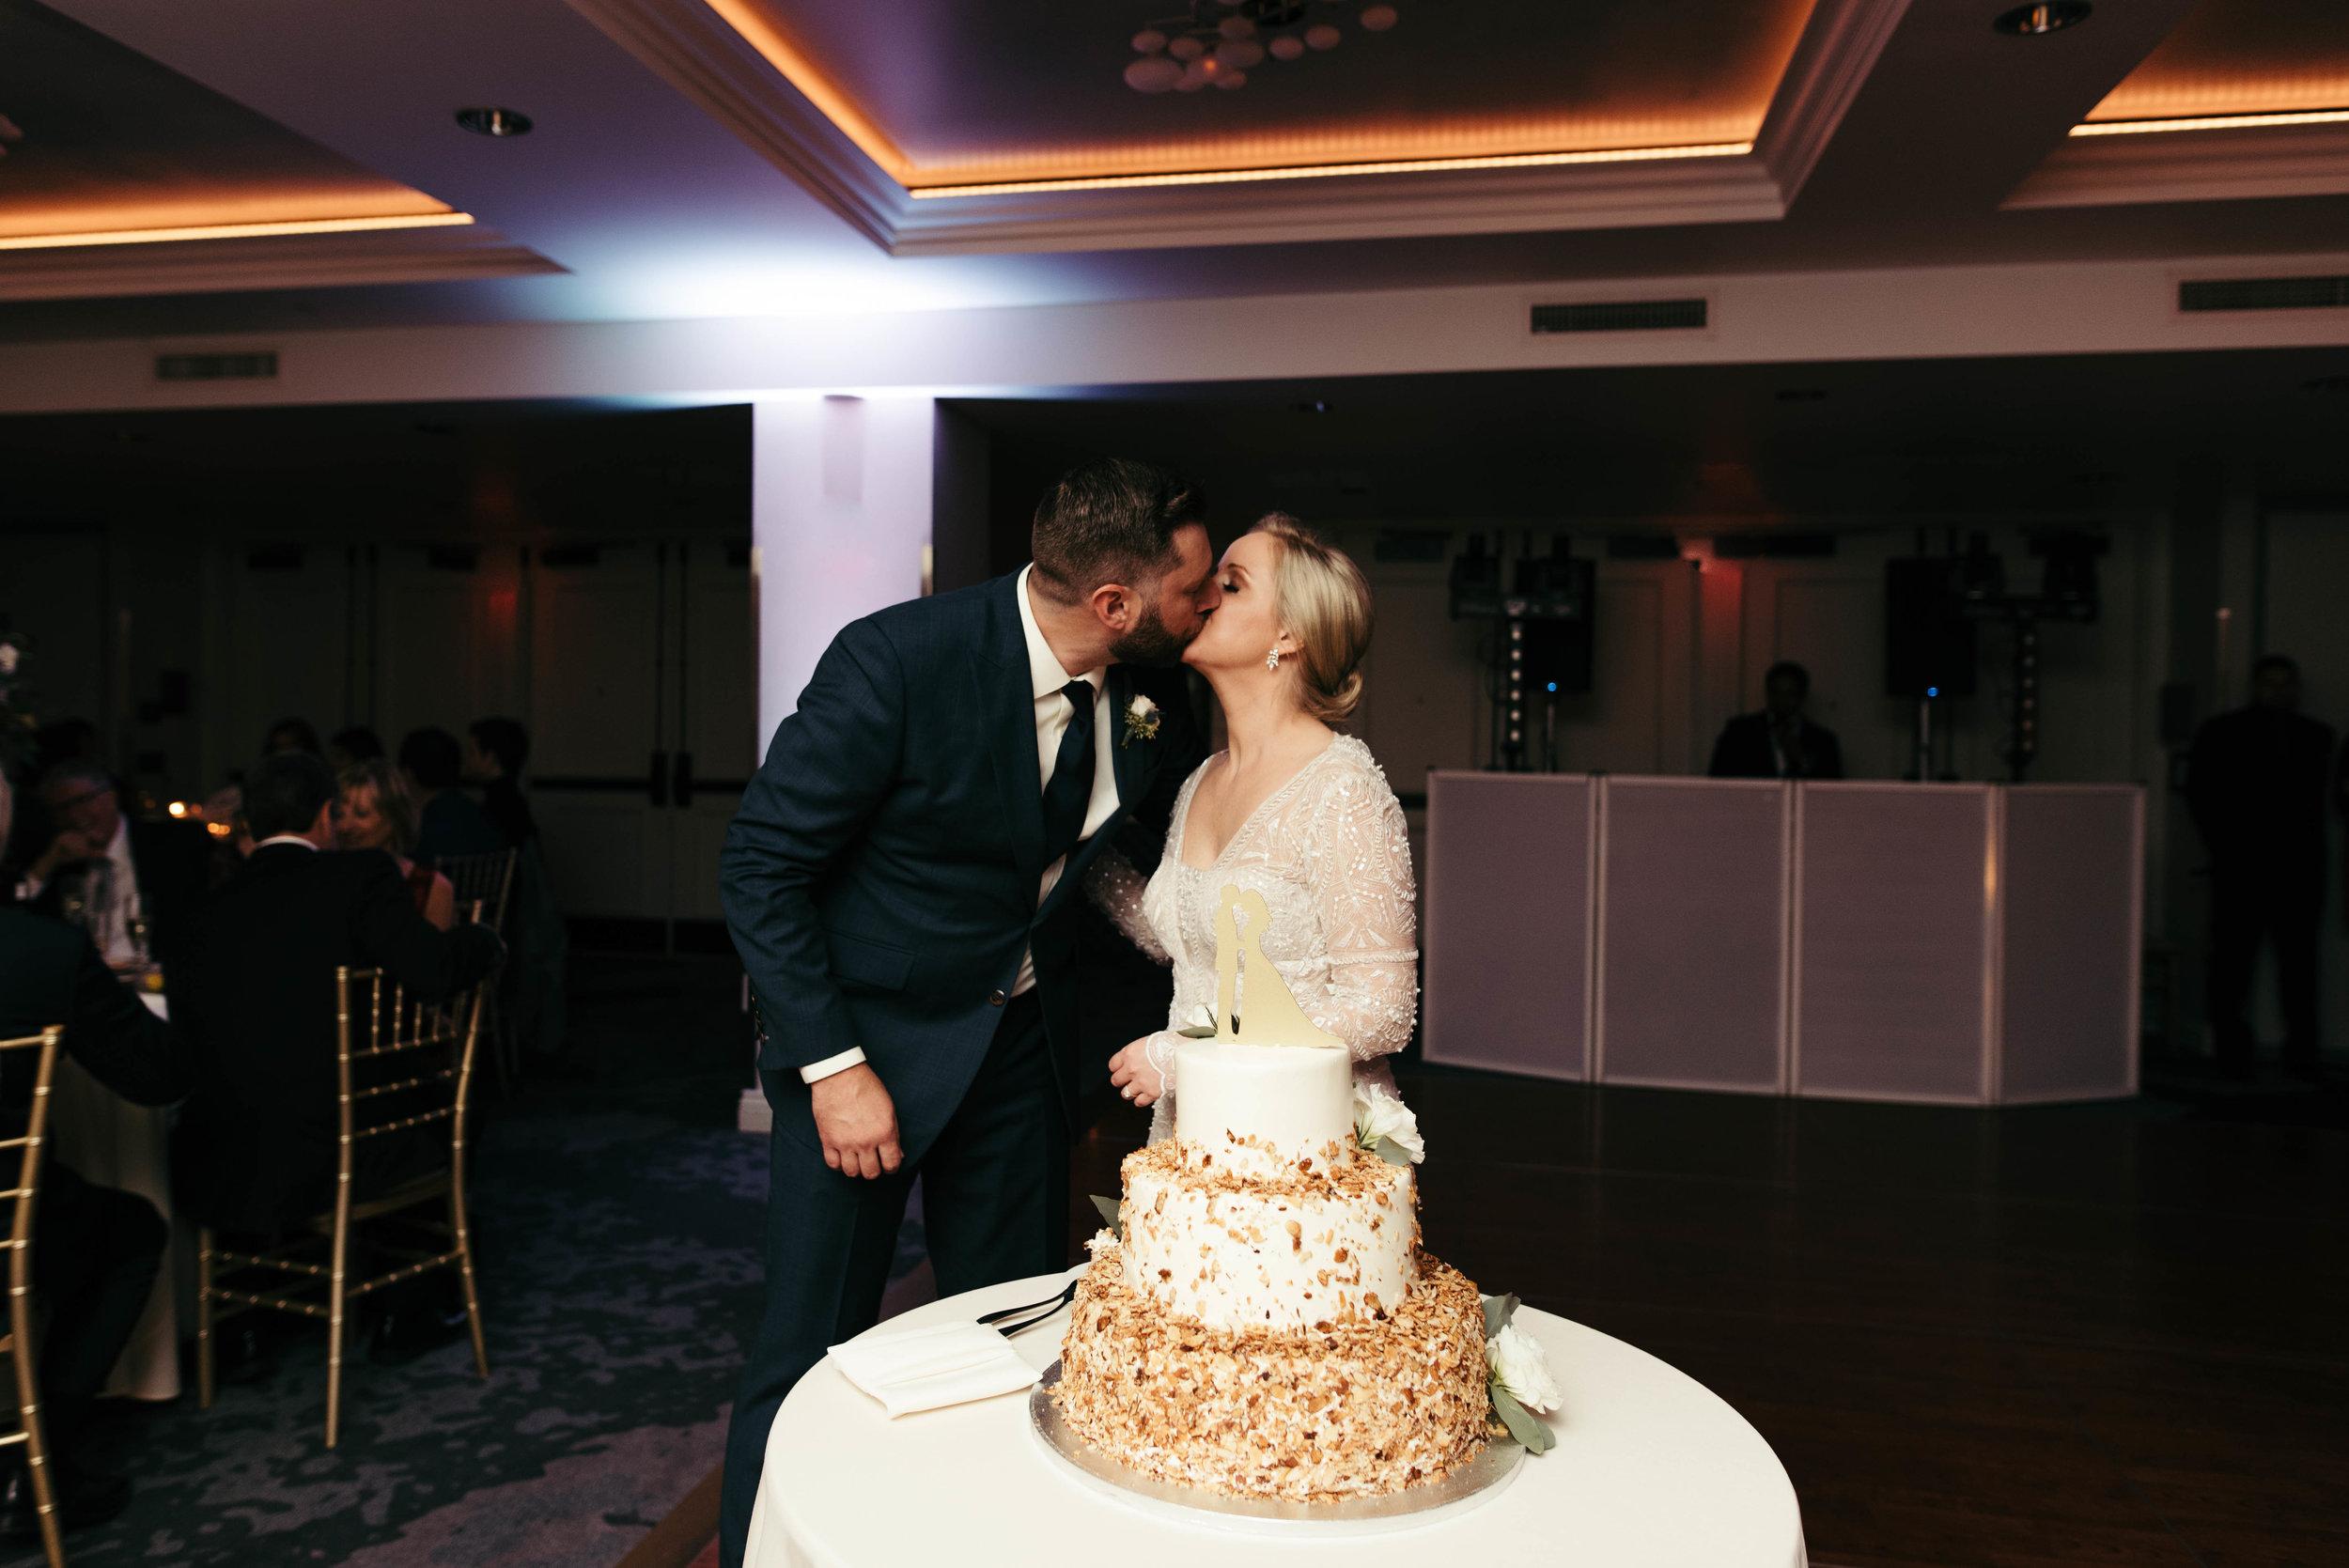 renaissance hotel wedding photos-48.jpg